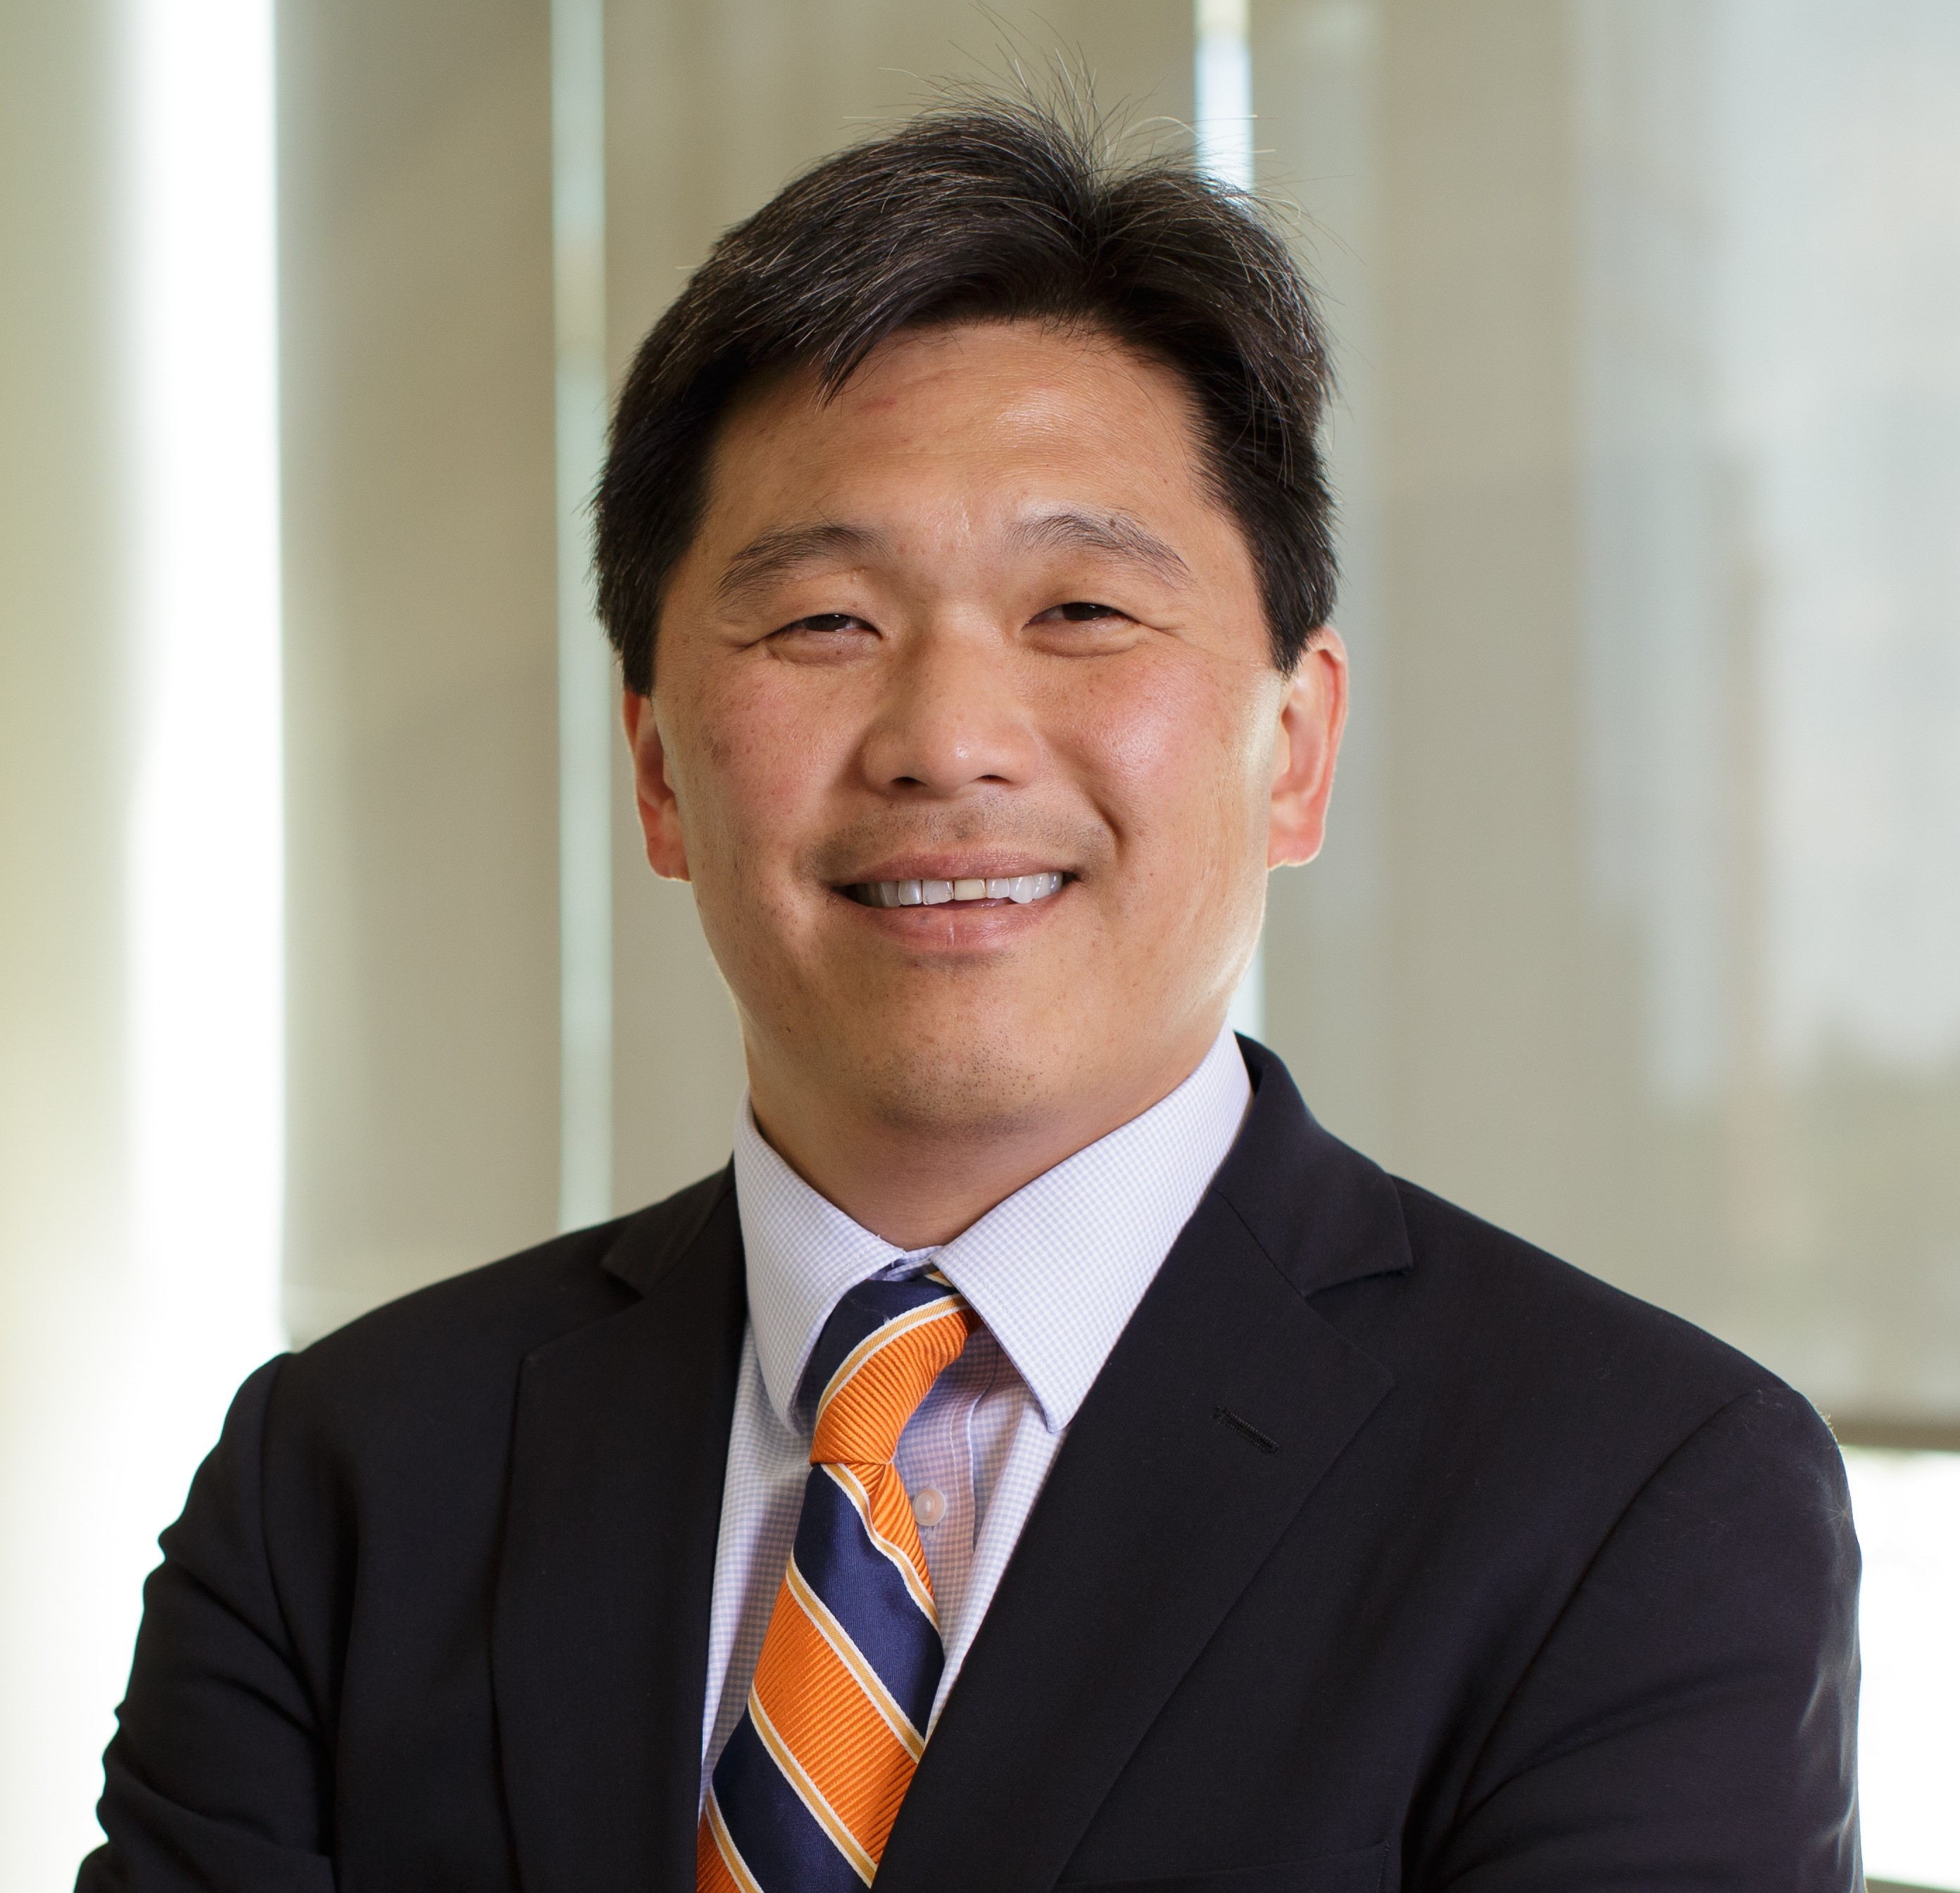 Brian L Hoh, M.D., F.A.C.S., Chief of UF Neurovascular program